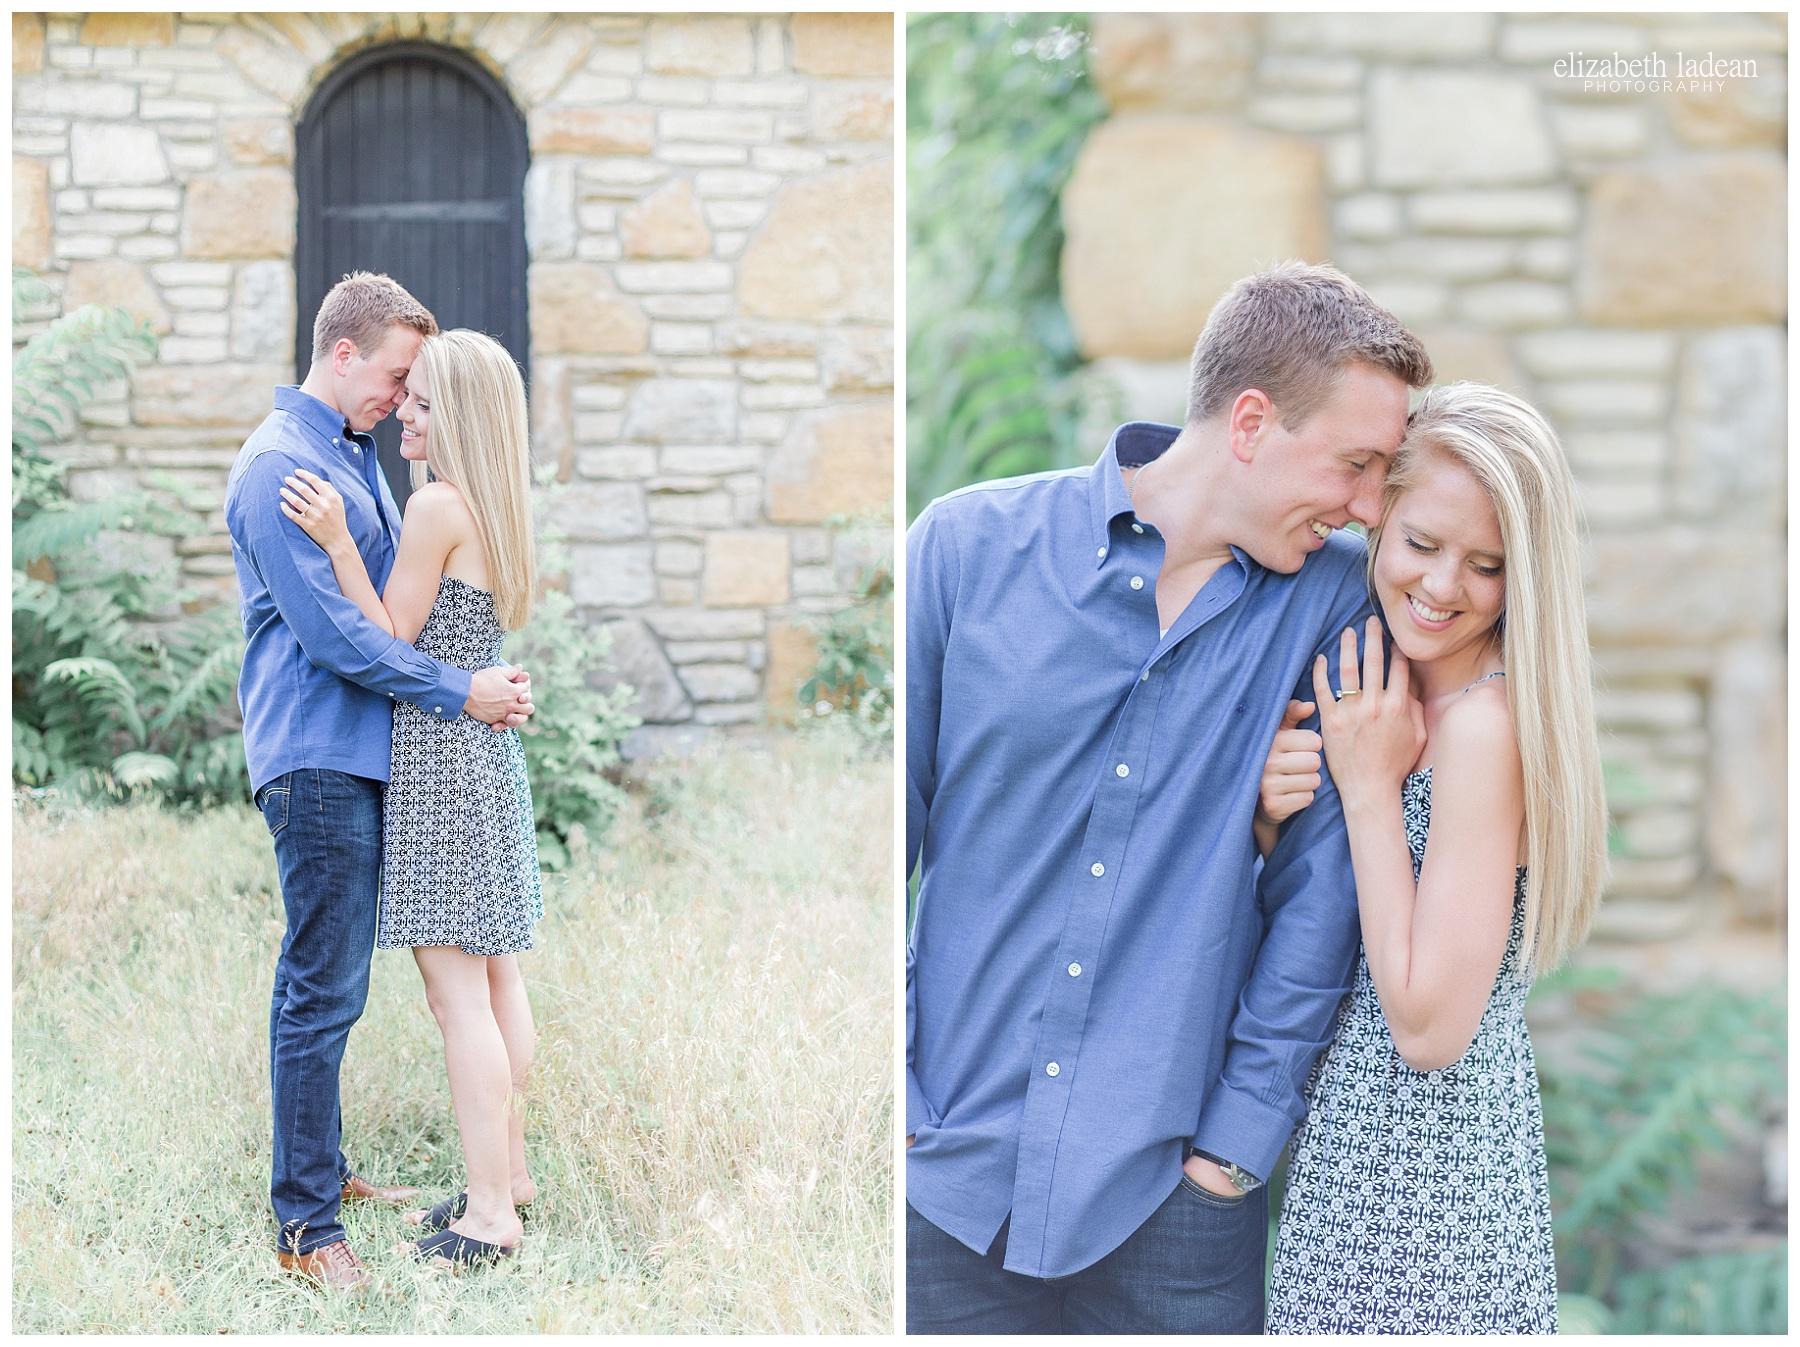 Engagement-Photos-Unity-Village-KC-Photography-A+R-Elizabeth-Ladean-Photography-photo_1365.jpg